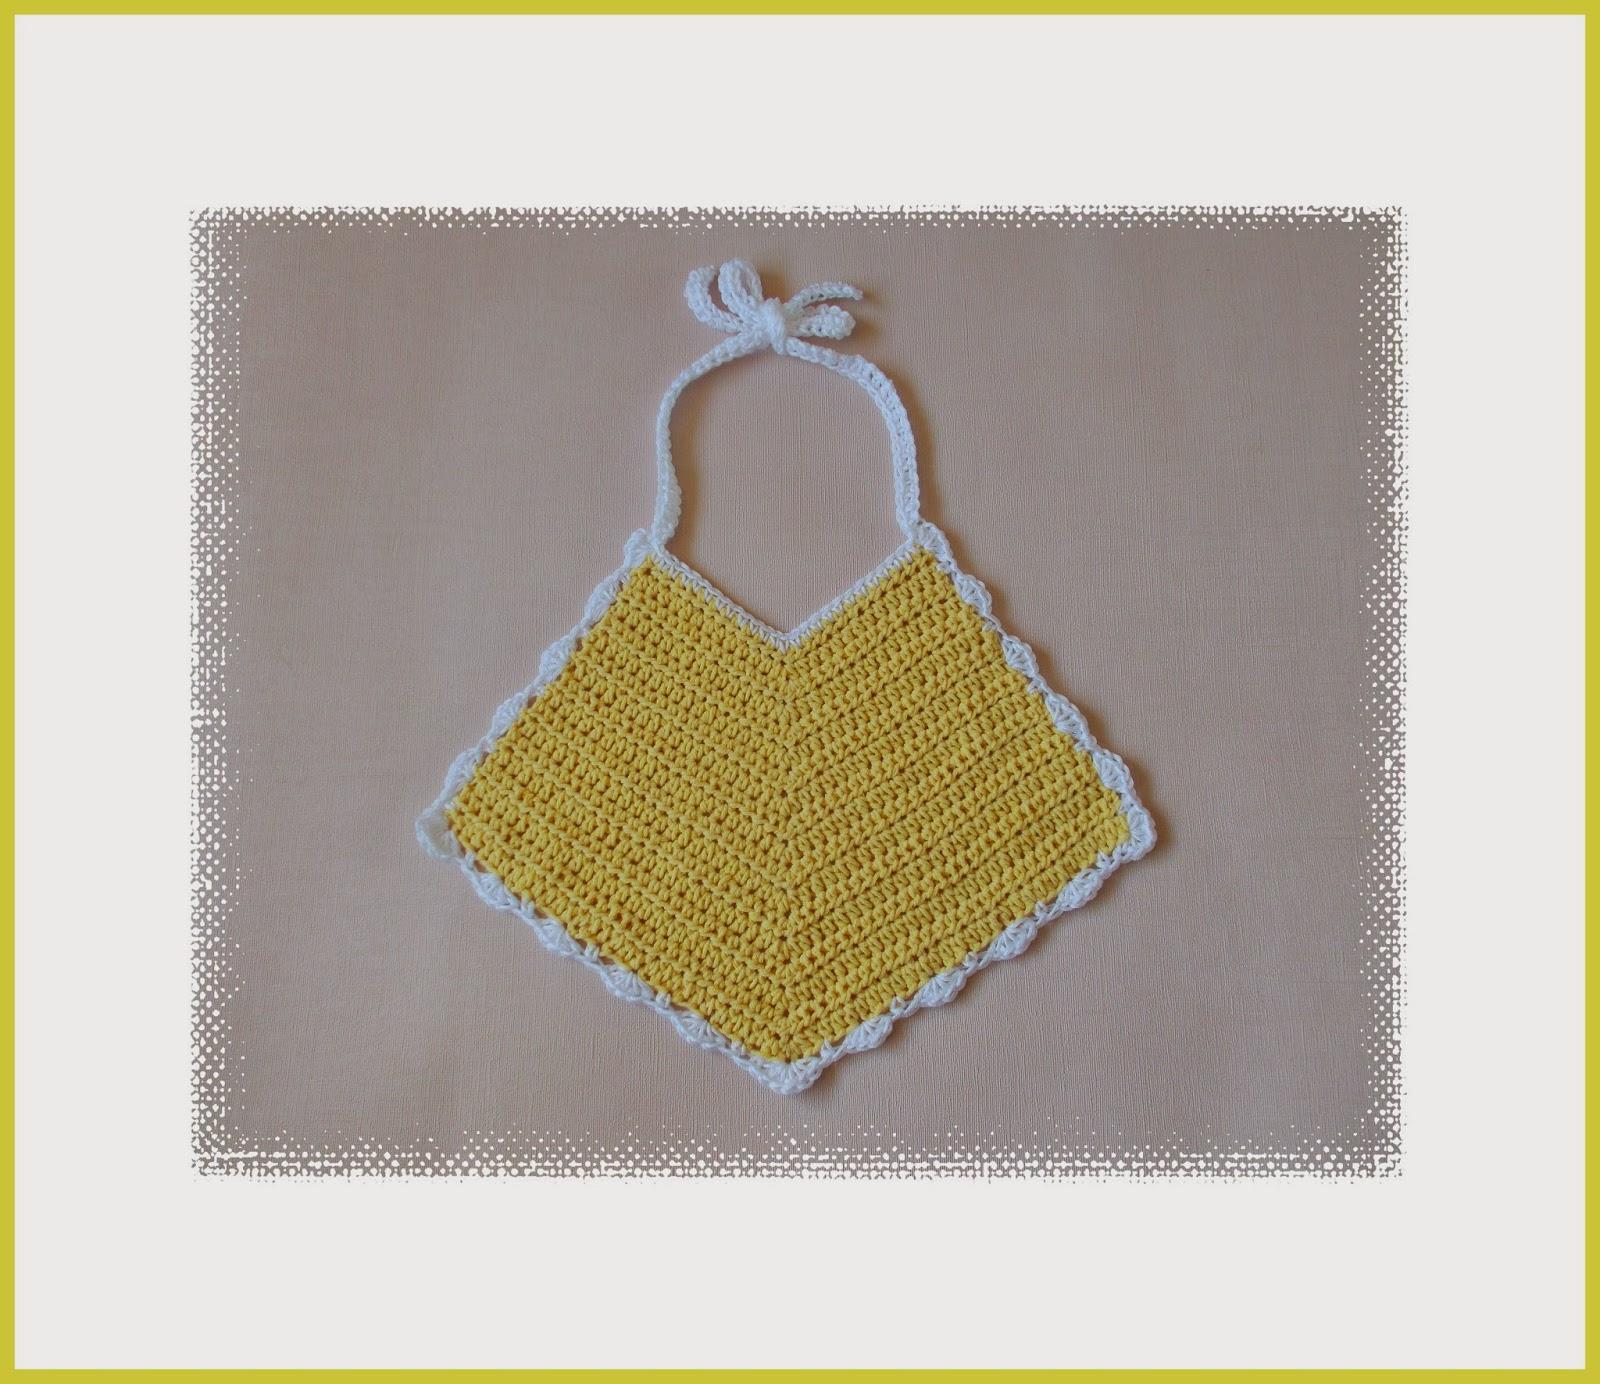 Crochet Cotton Baby Bib Pattern : mariannas lazy daisy days: Pretty Crochet Baby Bibs in ...